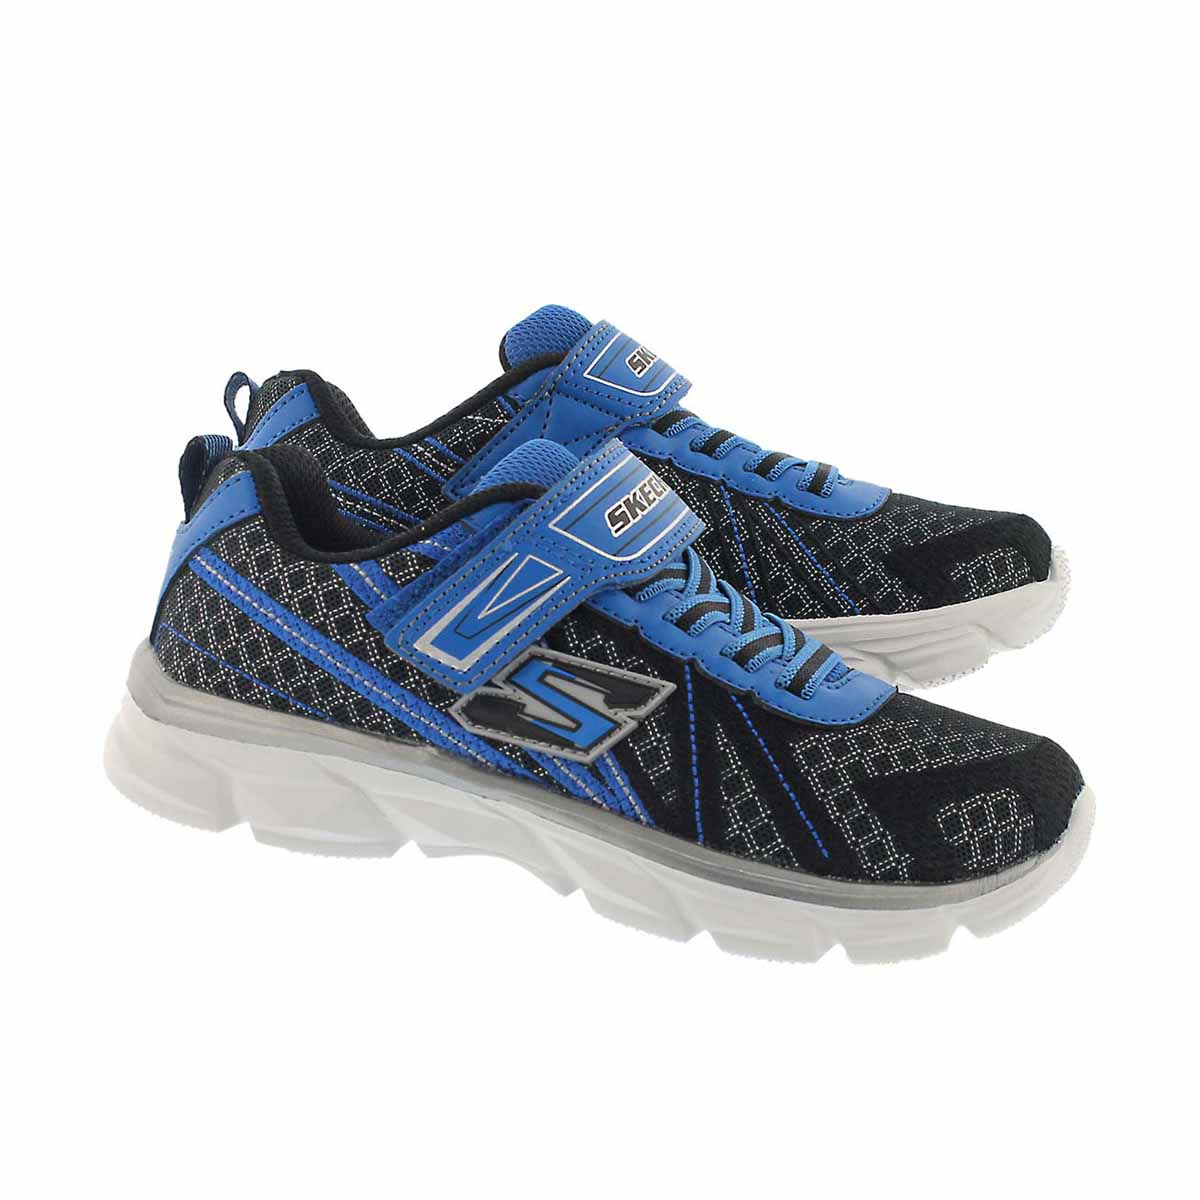 Bys Advance black/blue sneaker